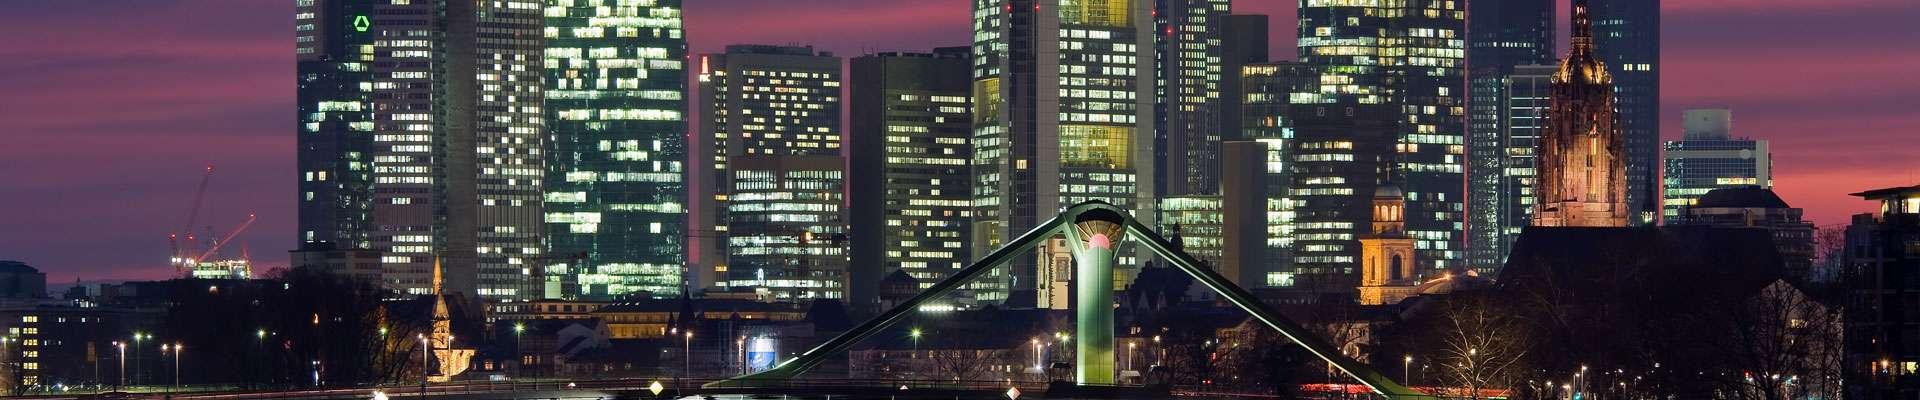 SEO Agentur Frankfurt am Main